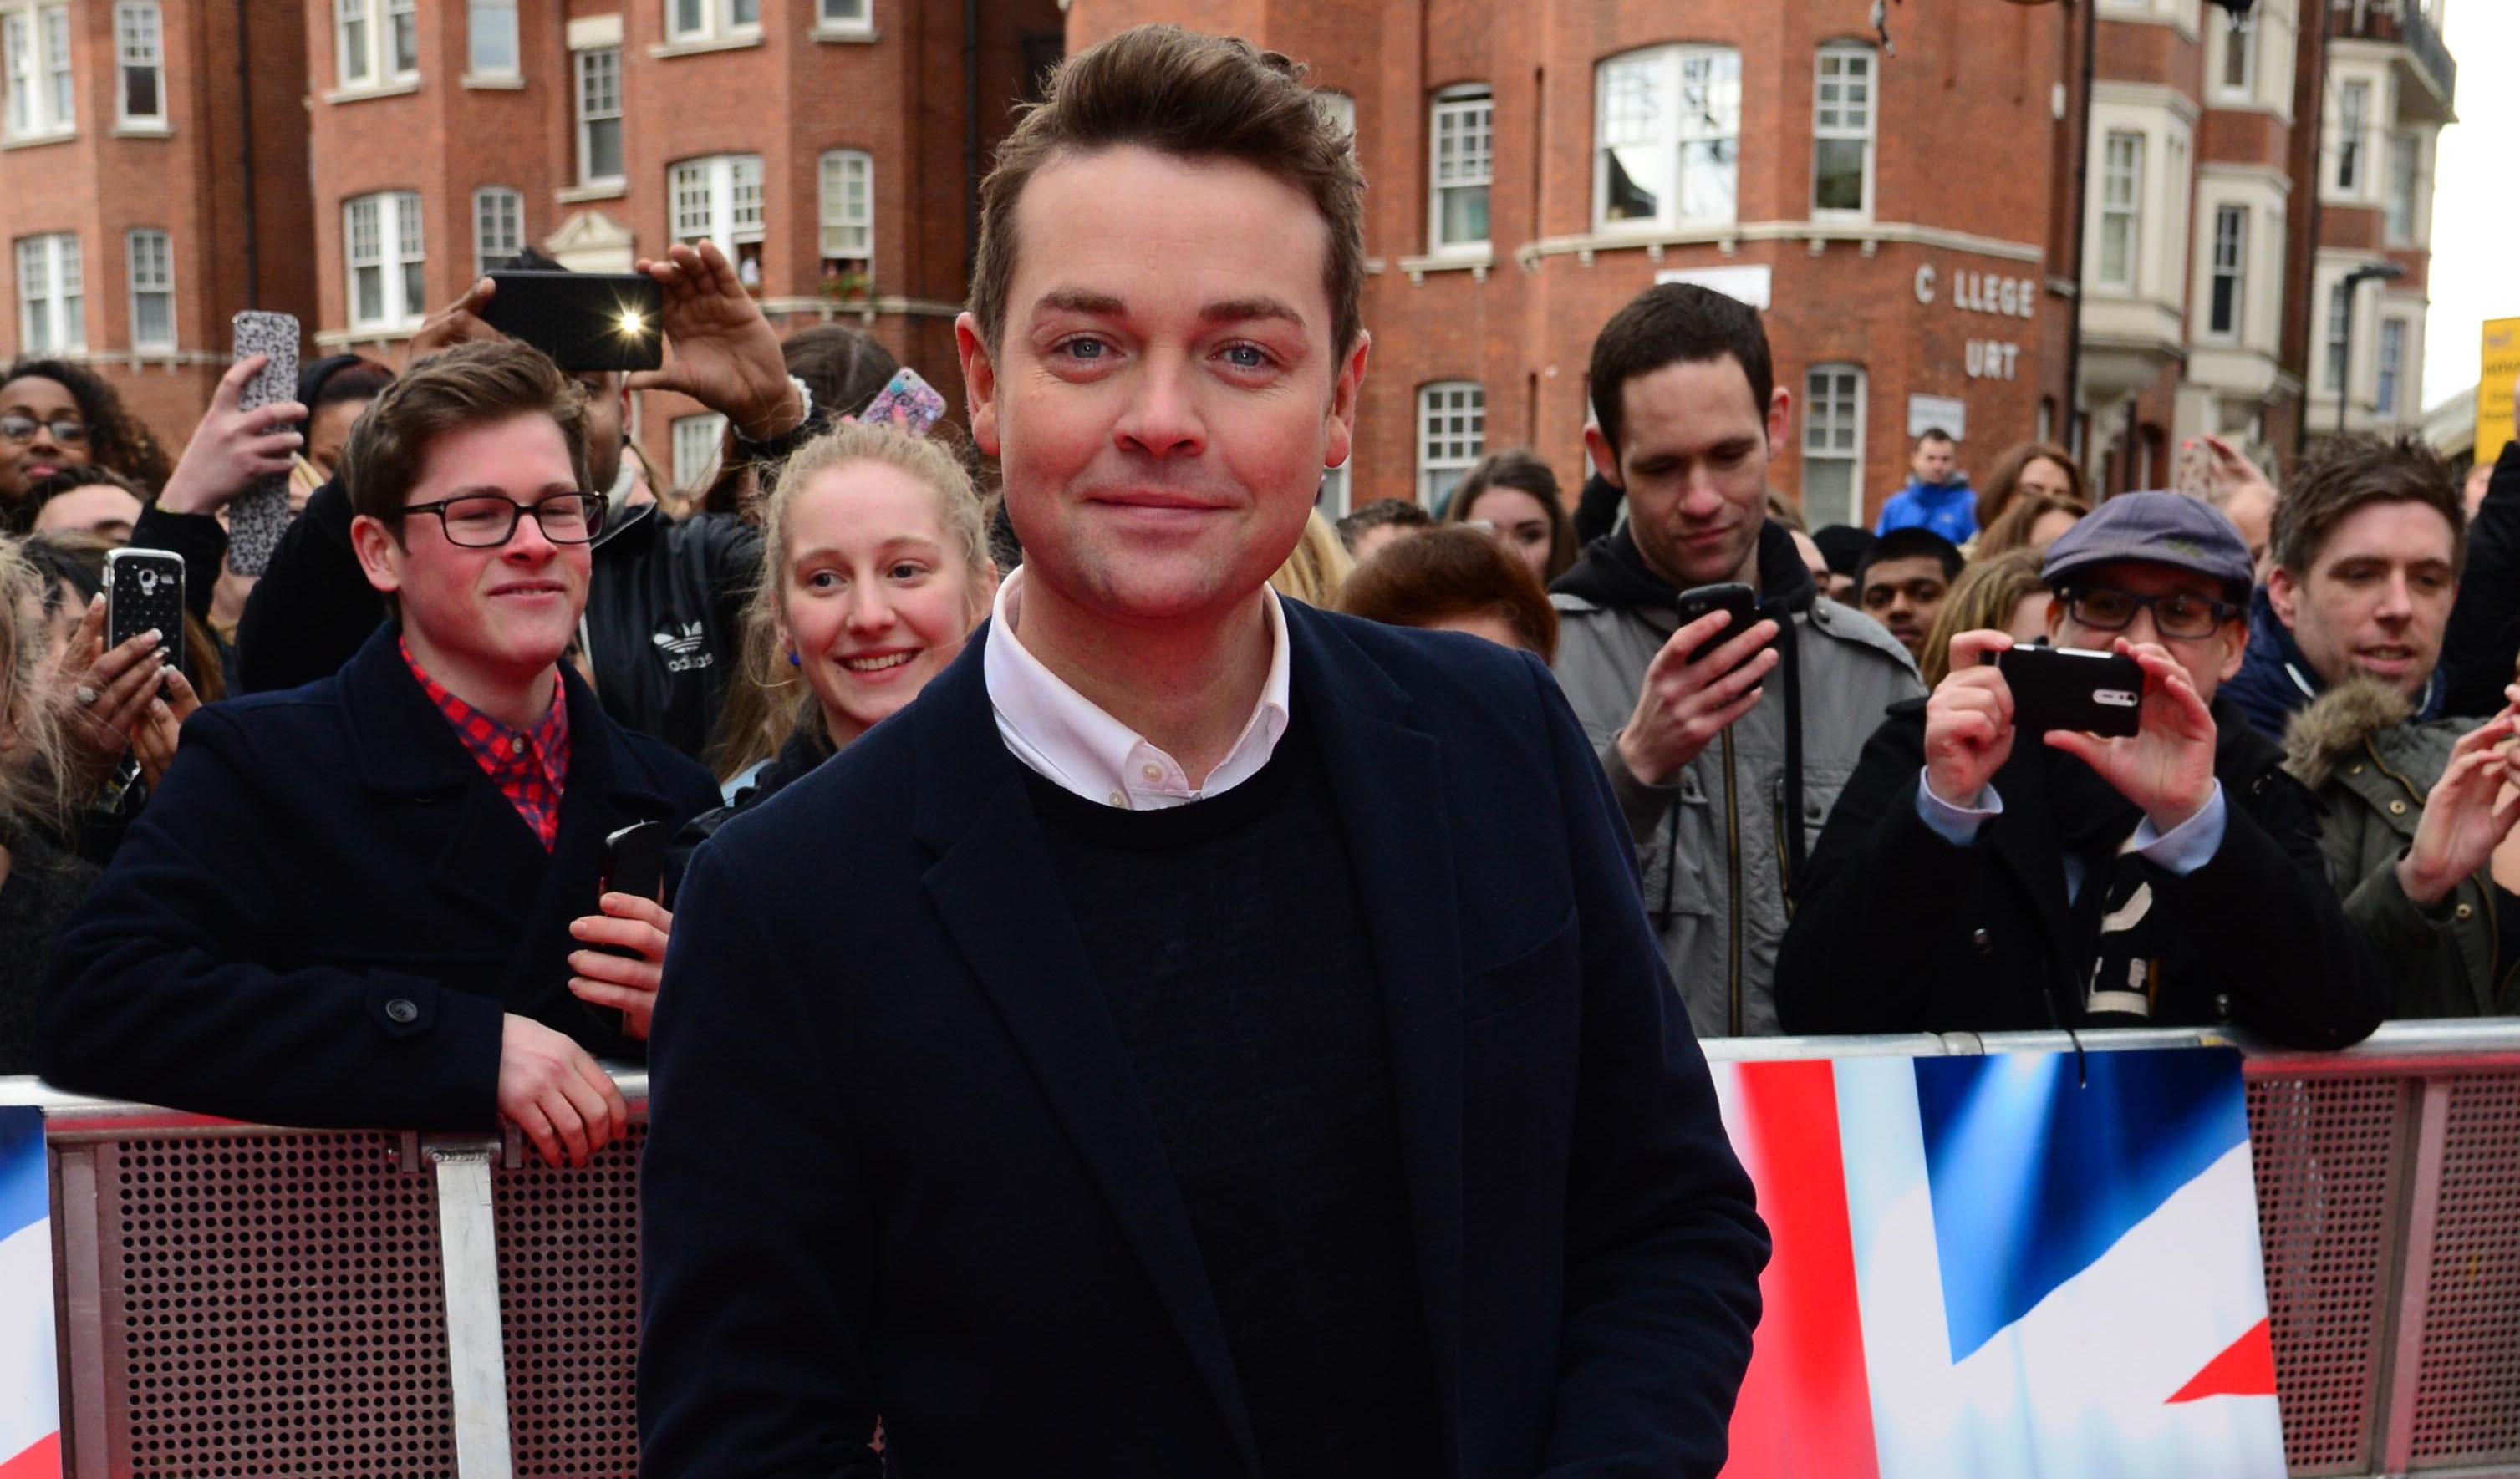 Britain's Got Talent - London Auditions - Stephen Mulhern